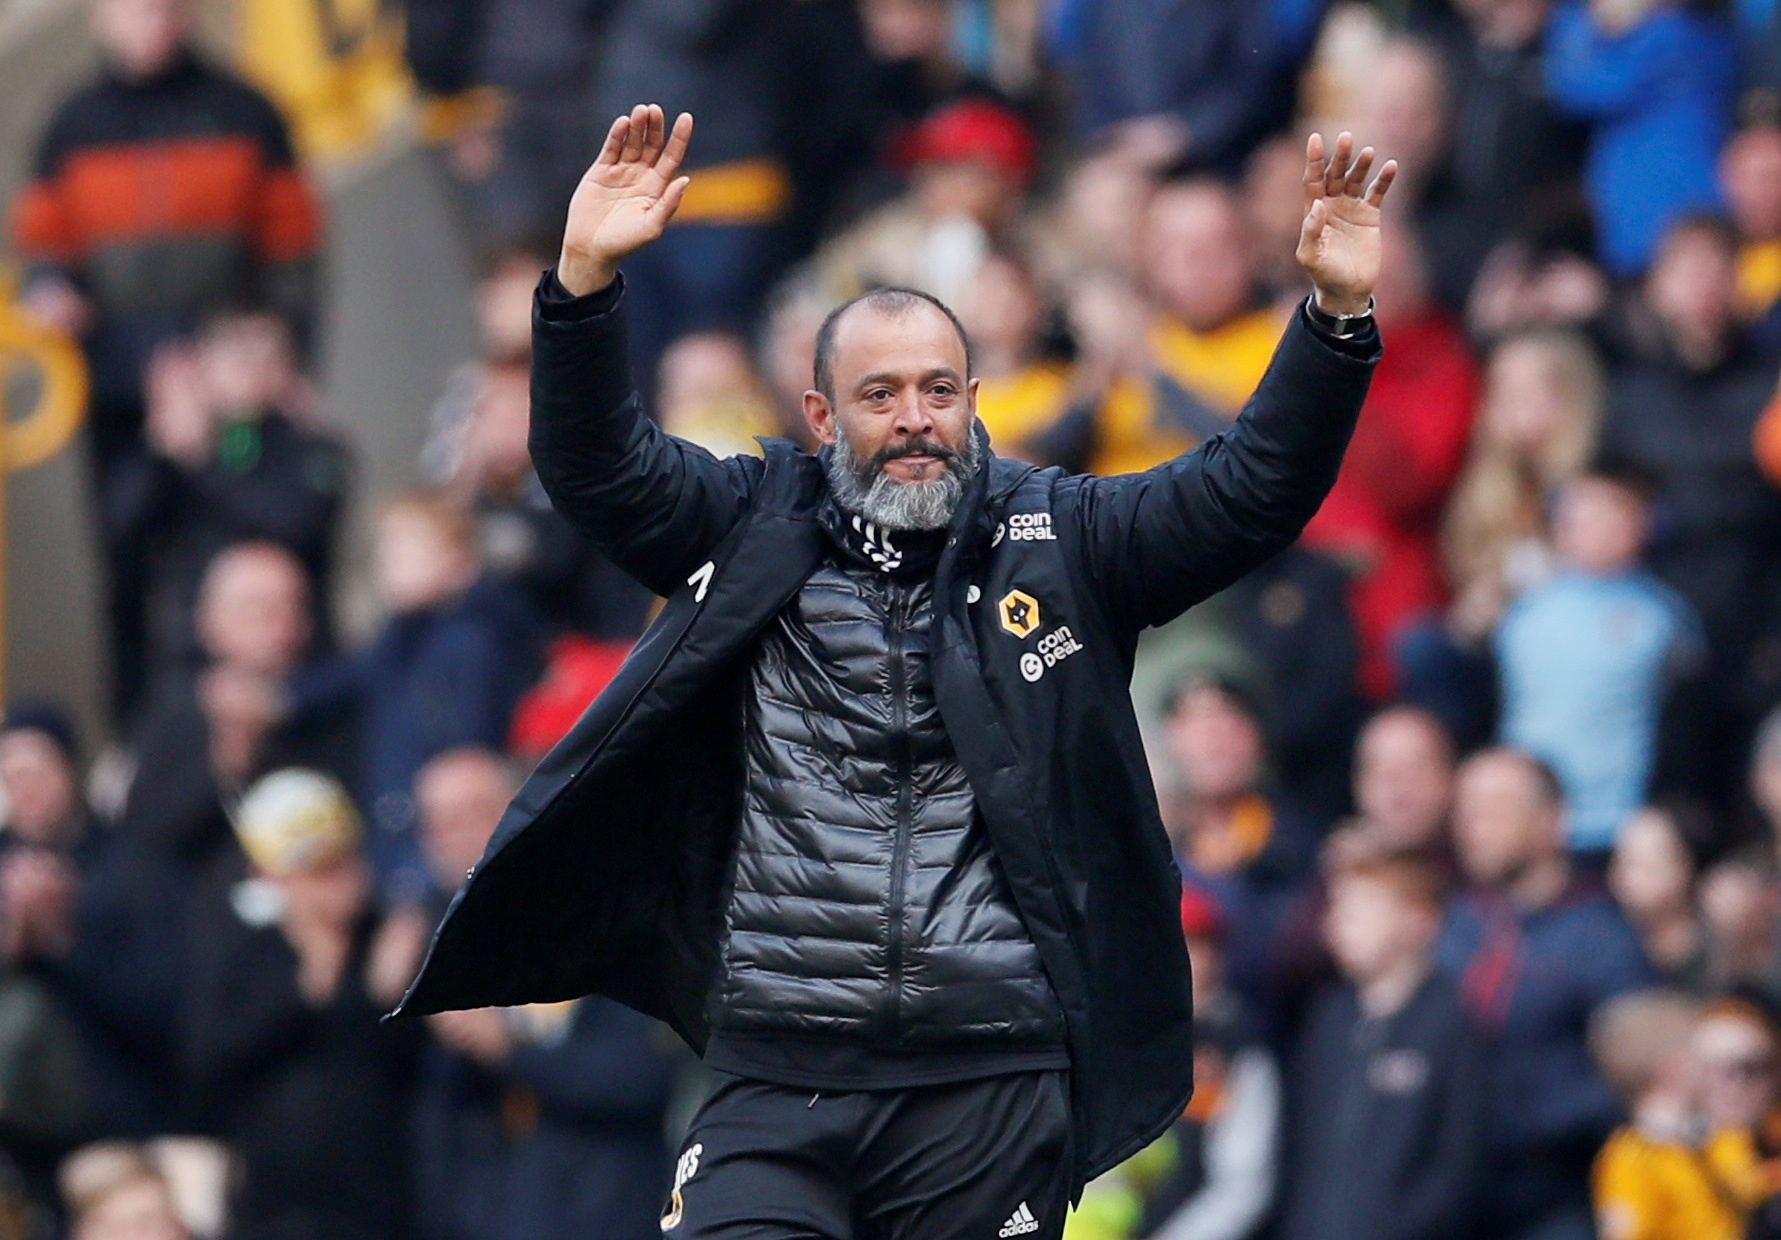 Football Espirito Santo Joins Nominations For Premier League Manager Award The Star